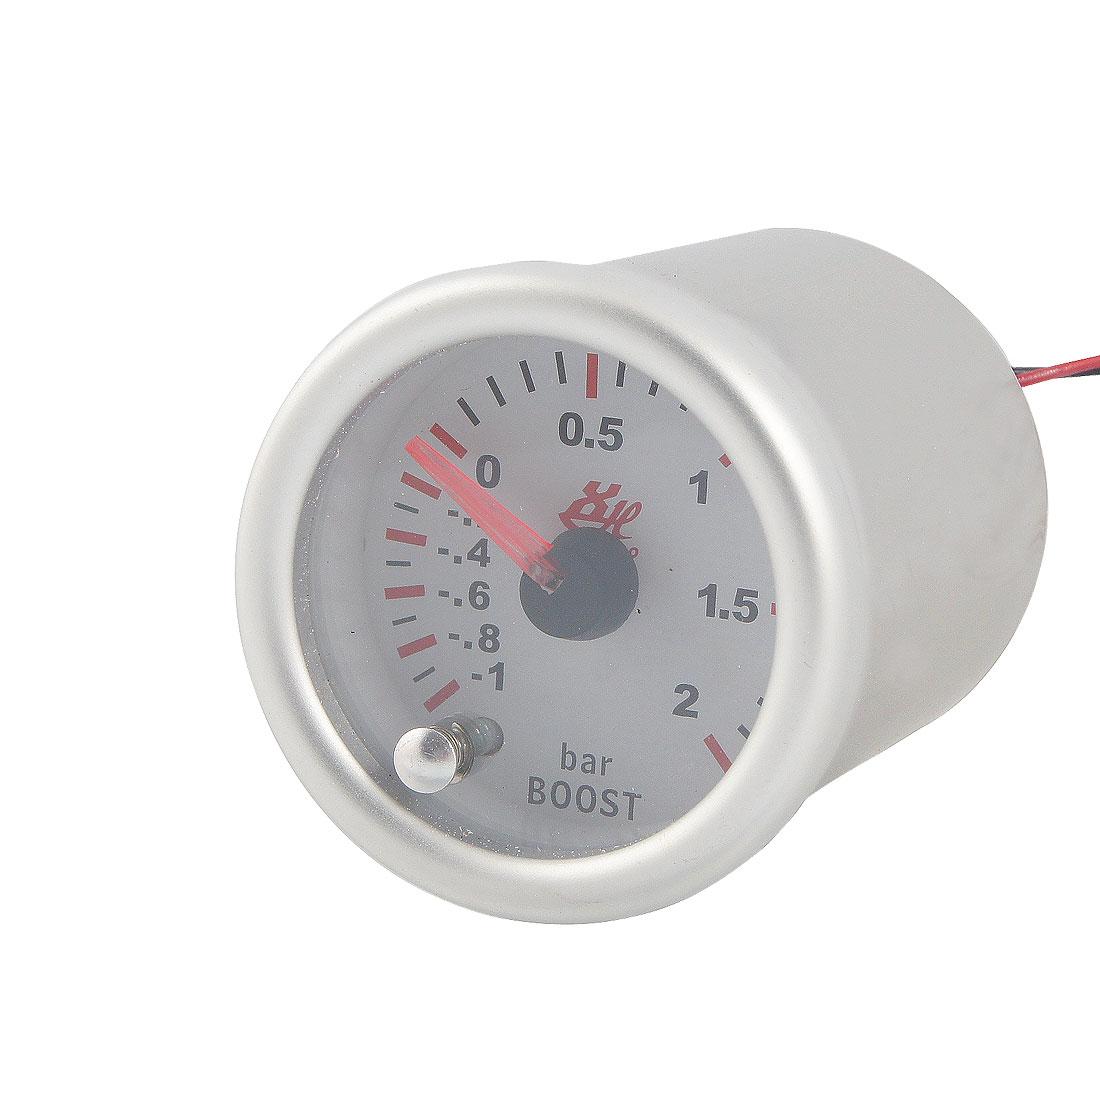 "Car 2"" Diameter Turbo Boost Pointed Indicating Vacuum Gauge"